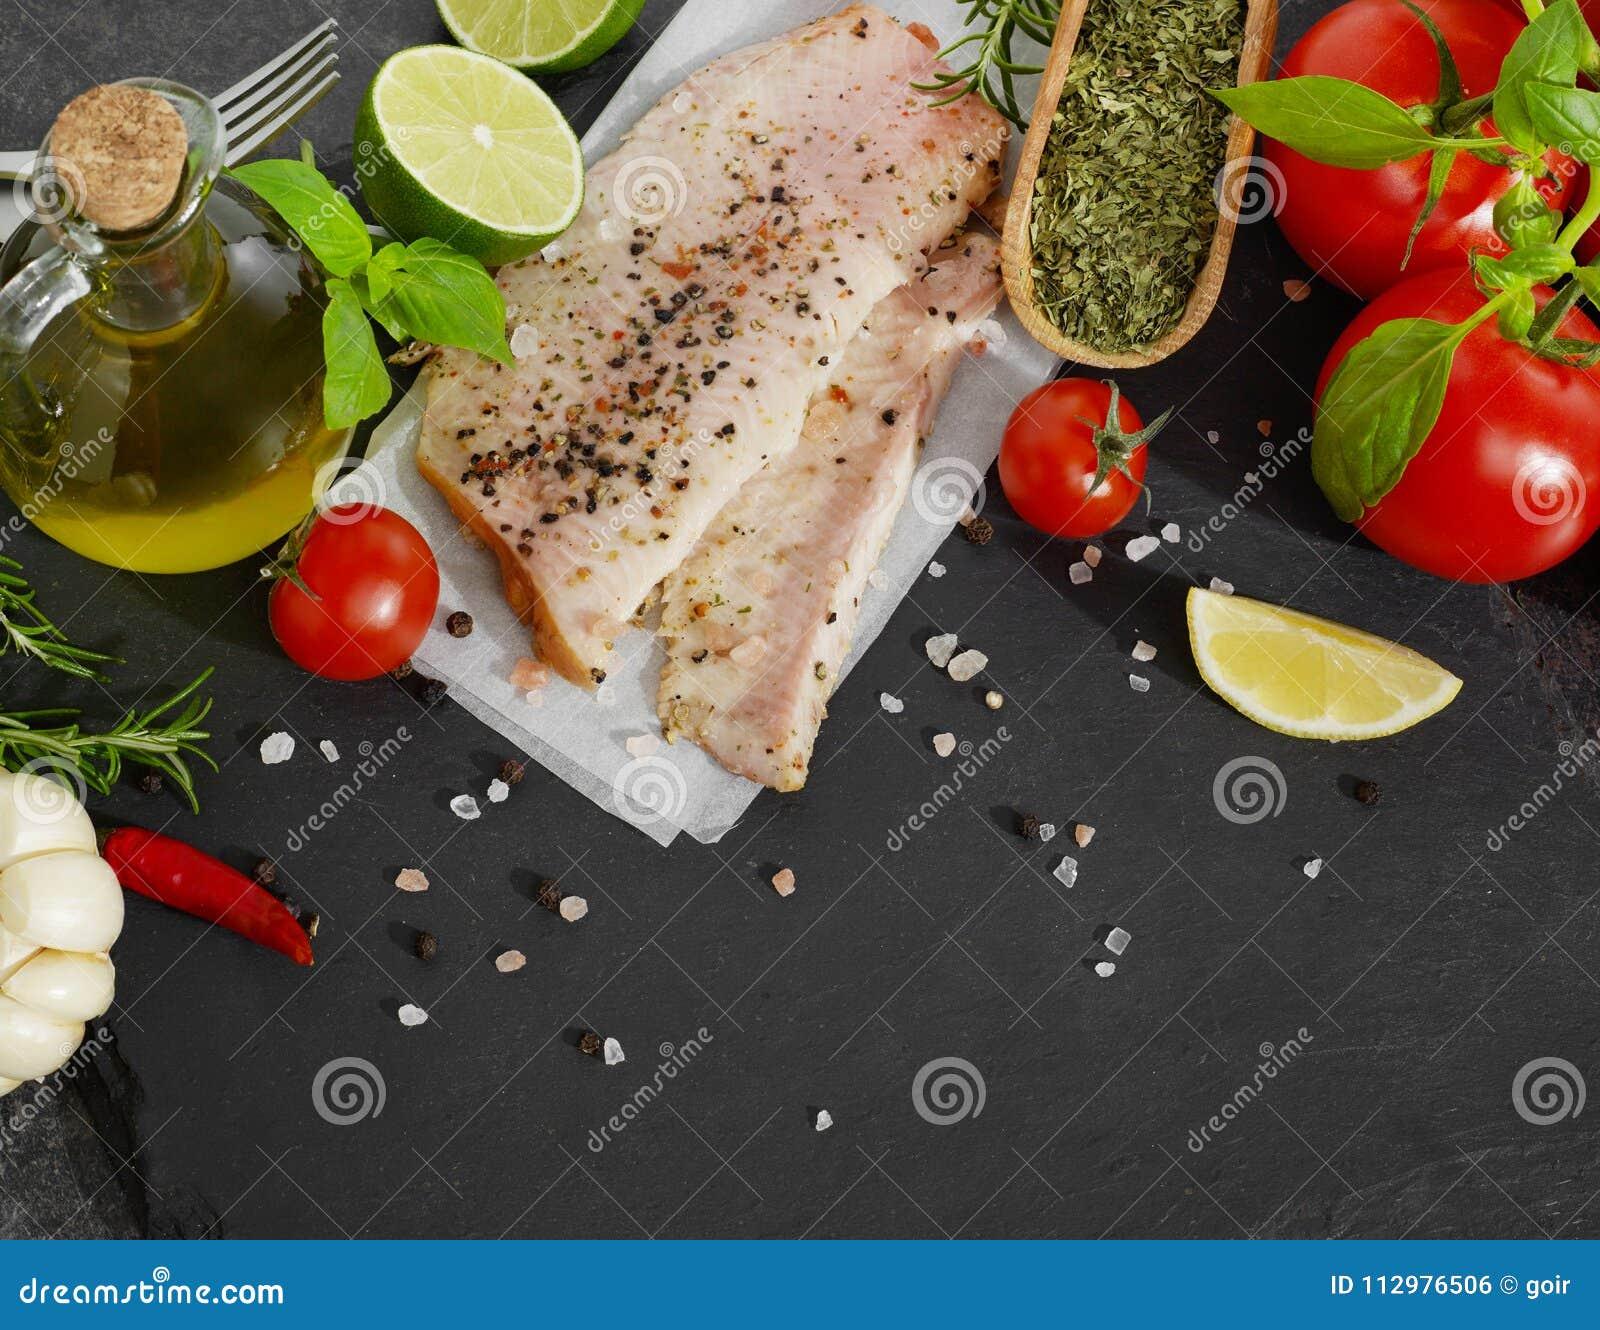 Fish fillet and seasoning